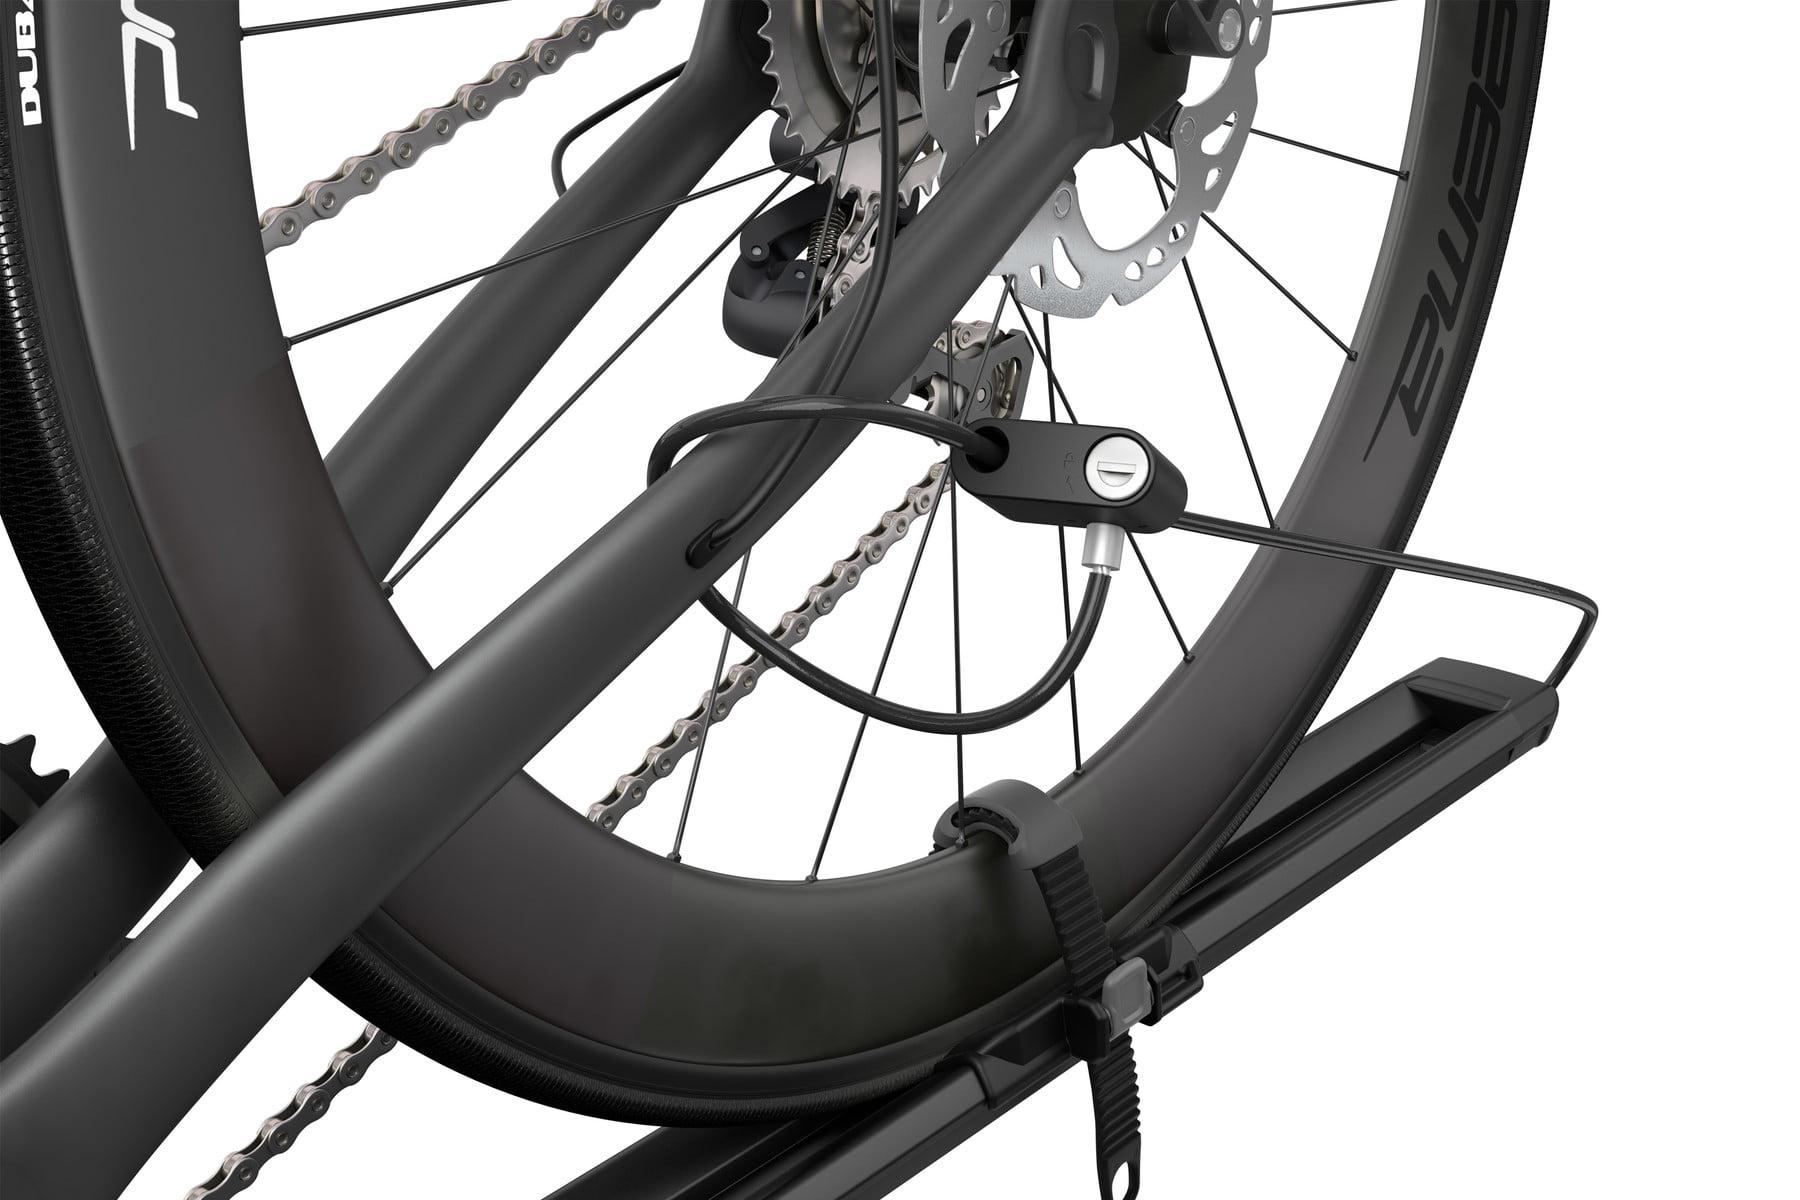 Suport biciclete Thule TopRide cu prindere pe bare transversale 7